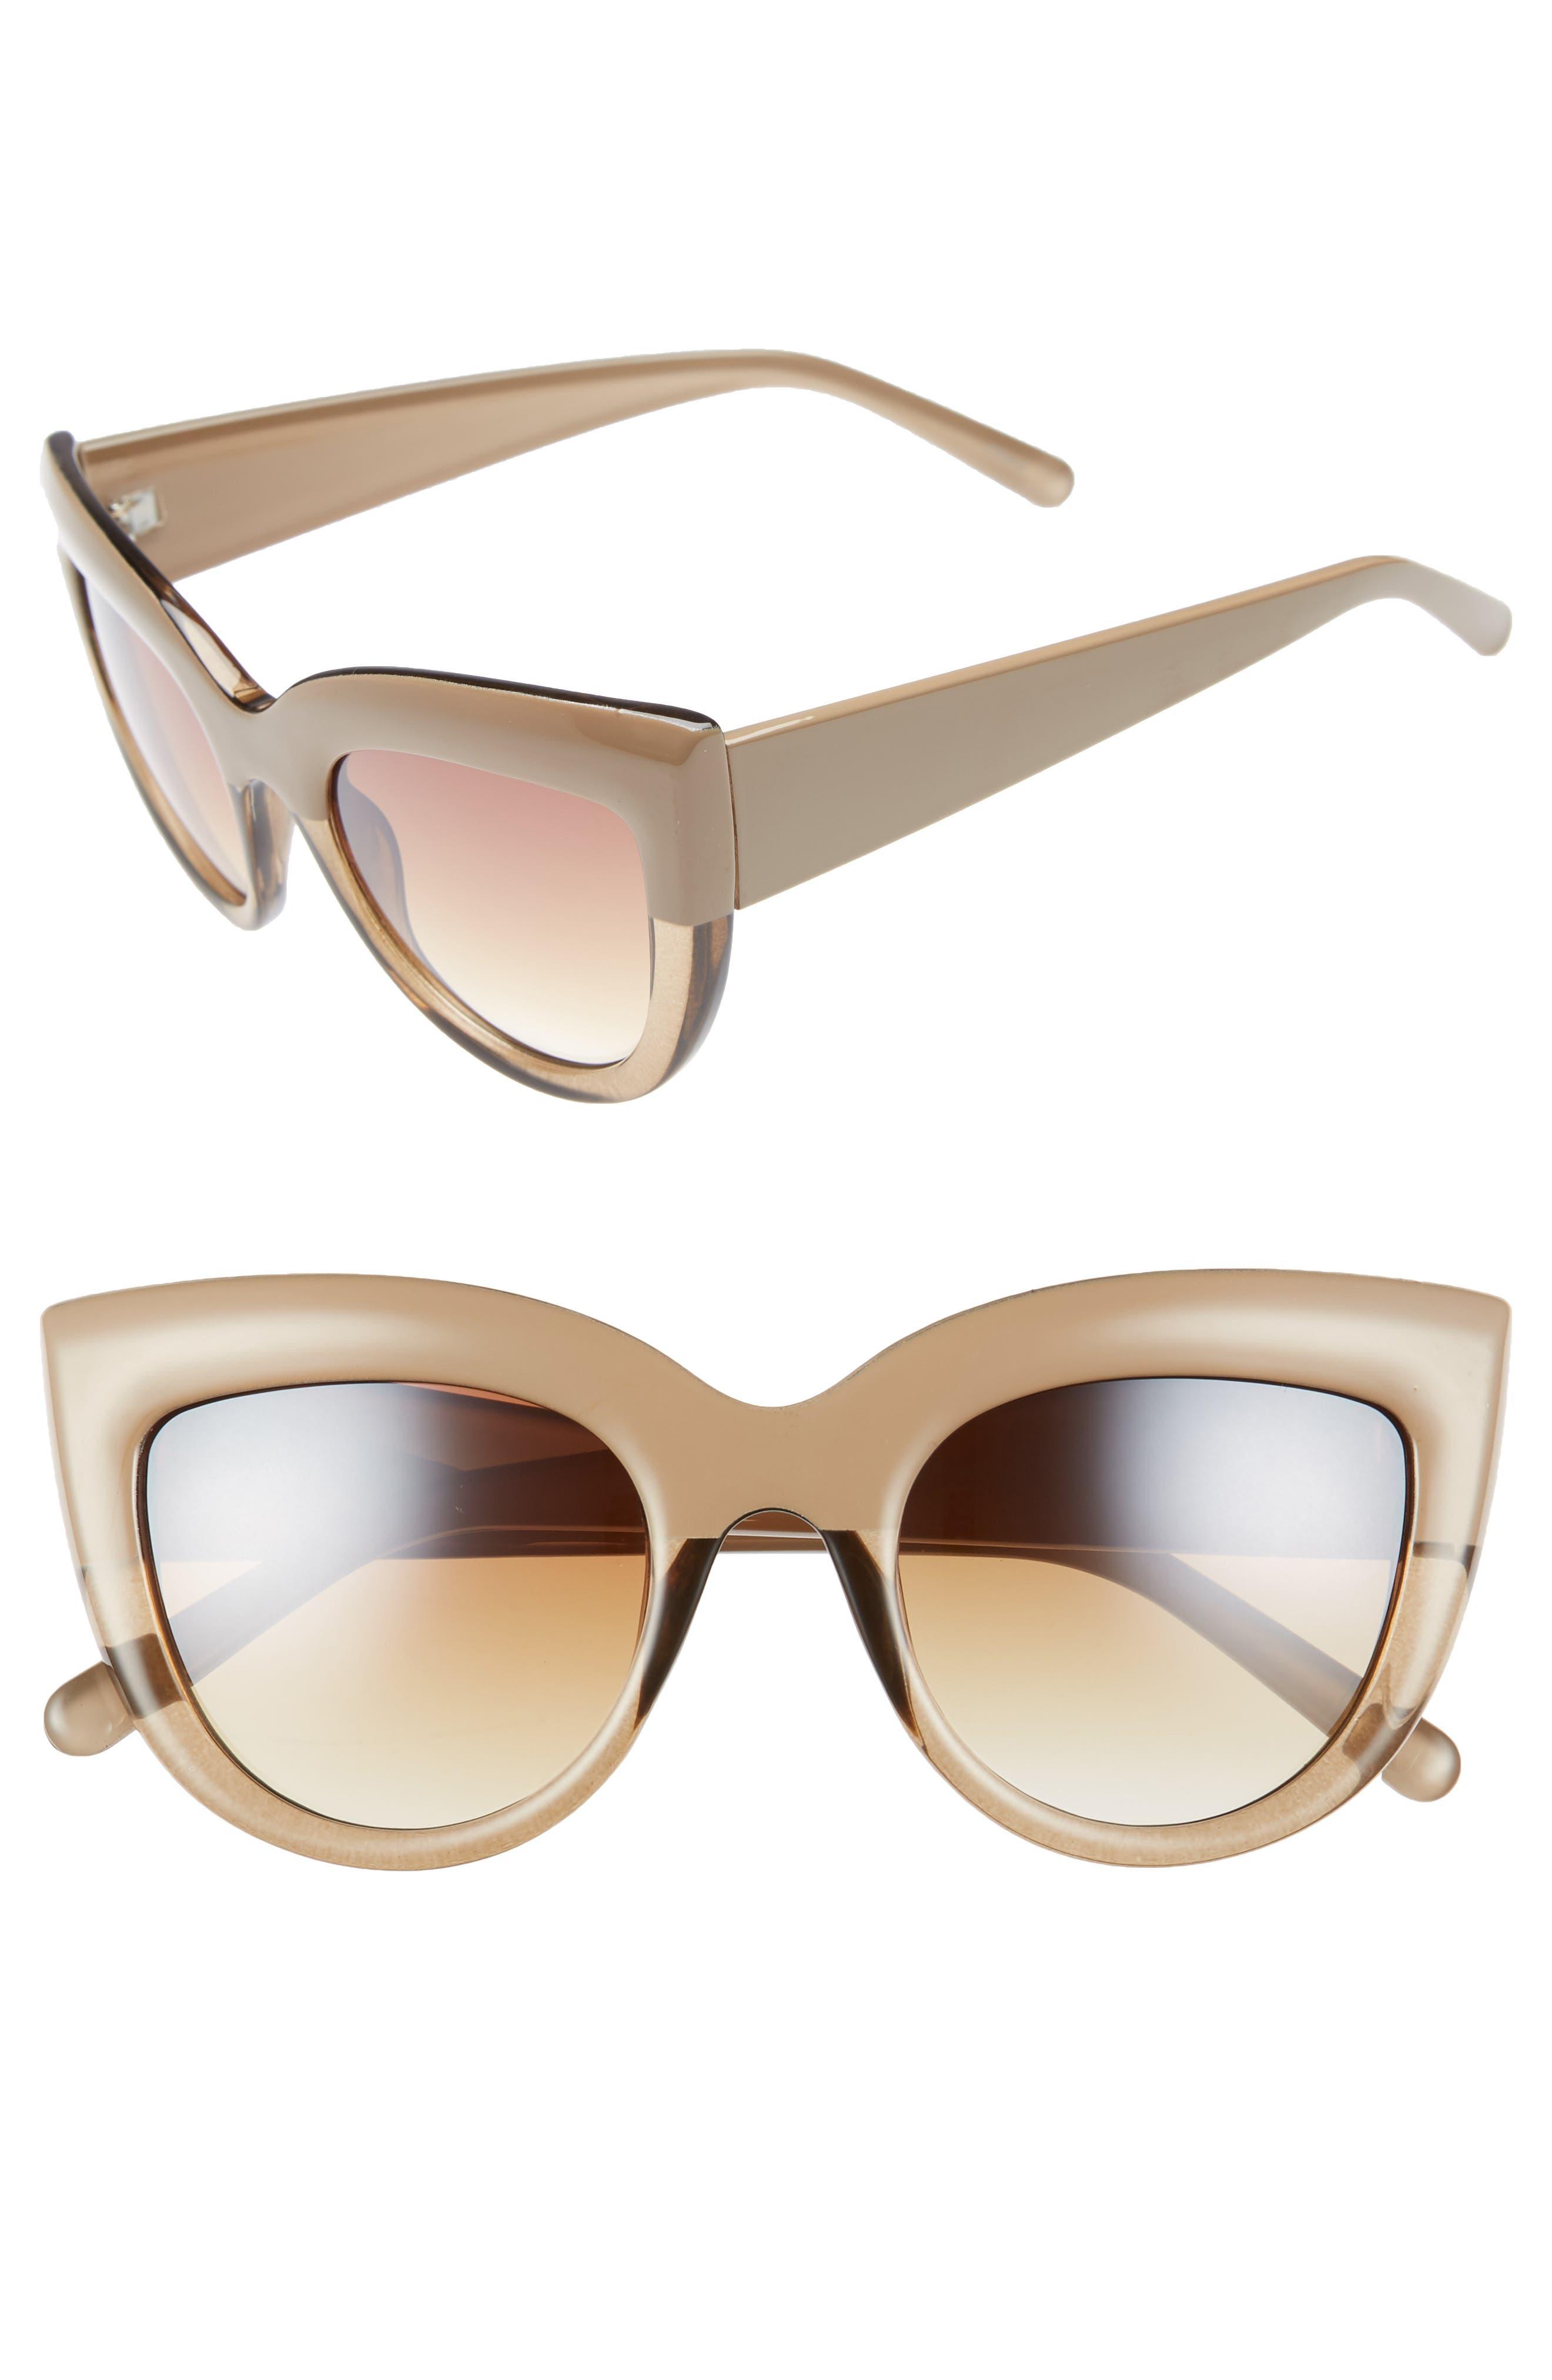 60mm Two-Tone Cat Eye Sunglasses,                         Main,                         color,